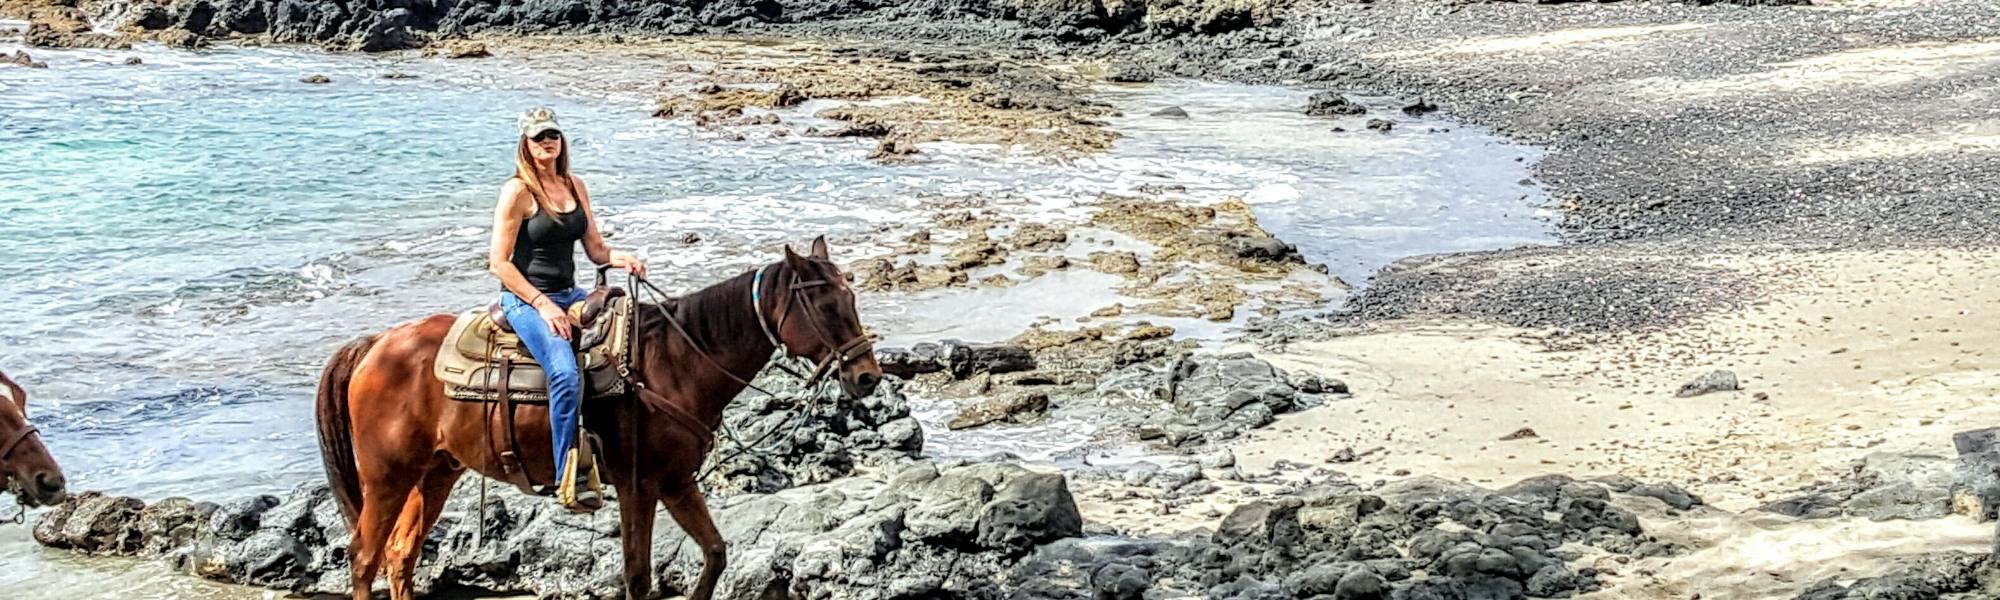 Makena Les Maui Horseback Riding On Sunset Rides